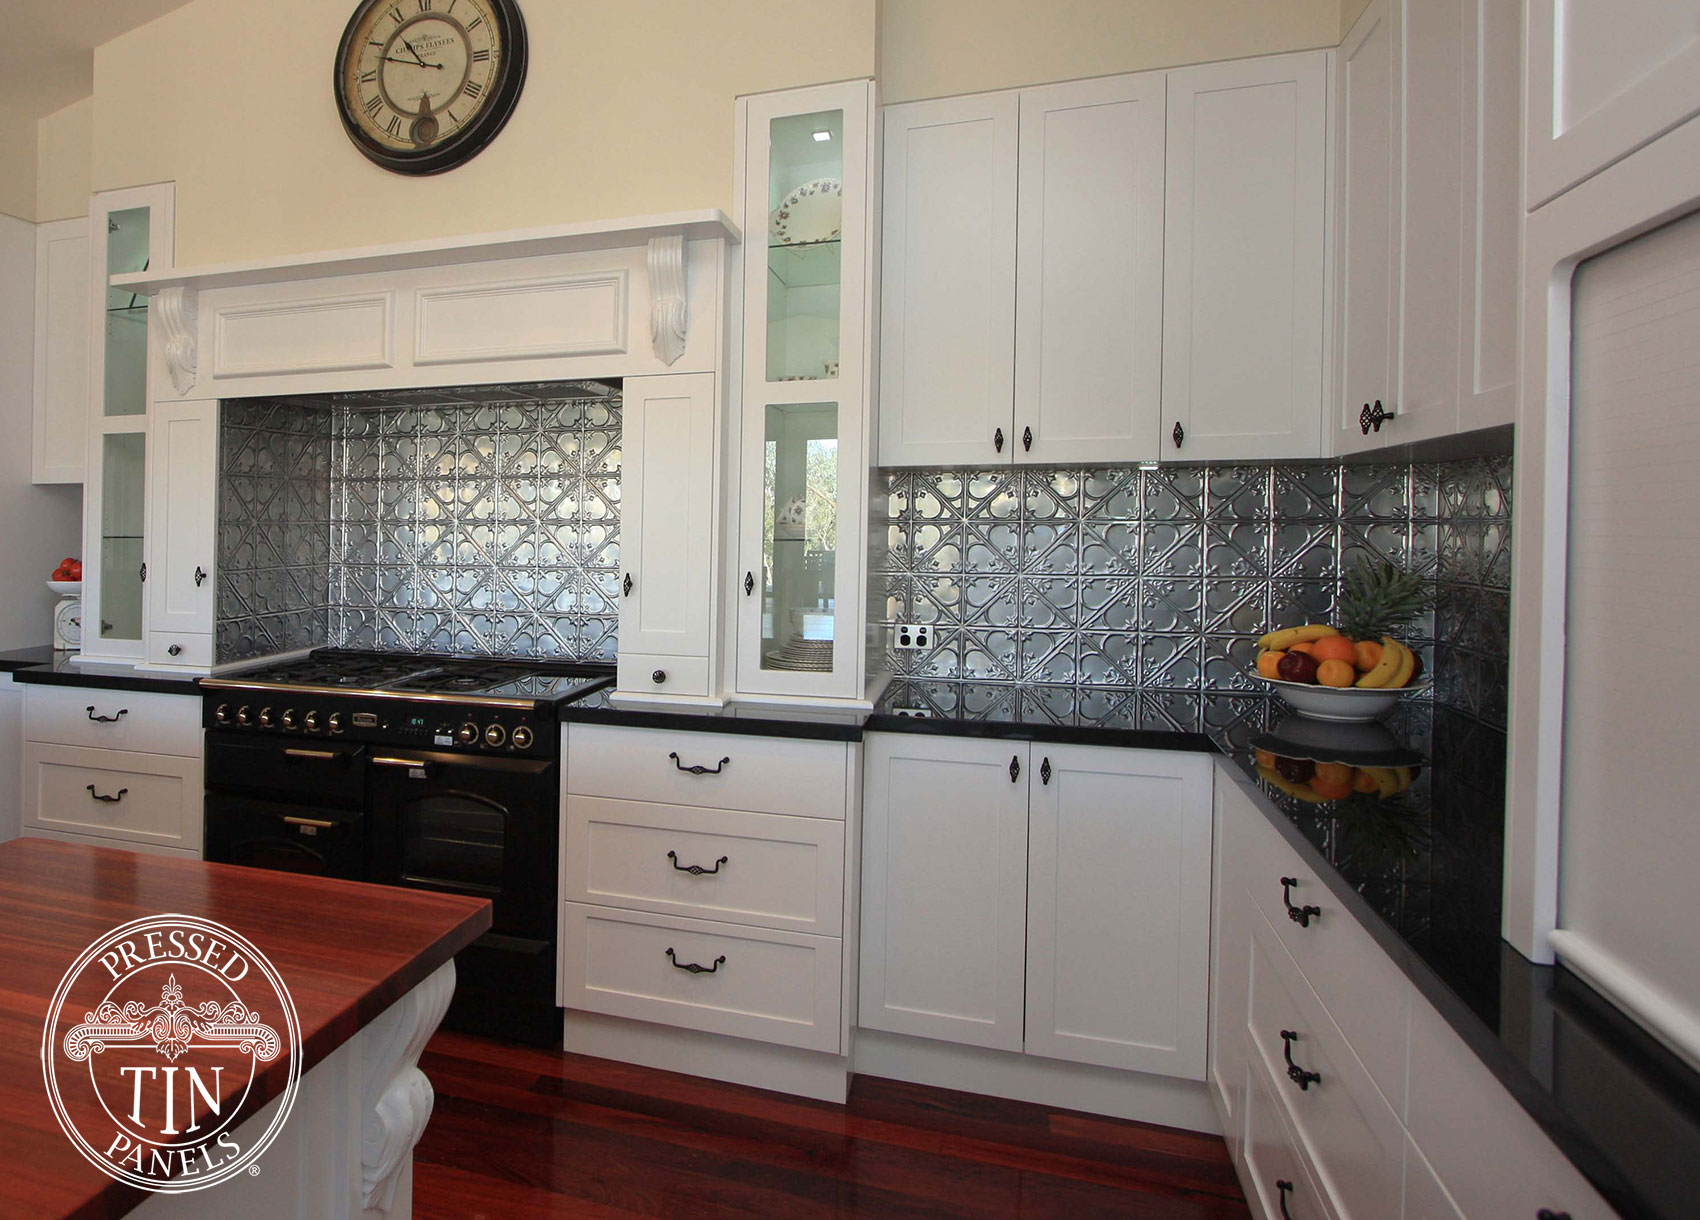 snowflakes silver kitchen splashback flair cabinets. Black Bedroom Furniture Sets. Home Design Ideas